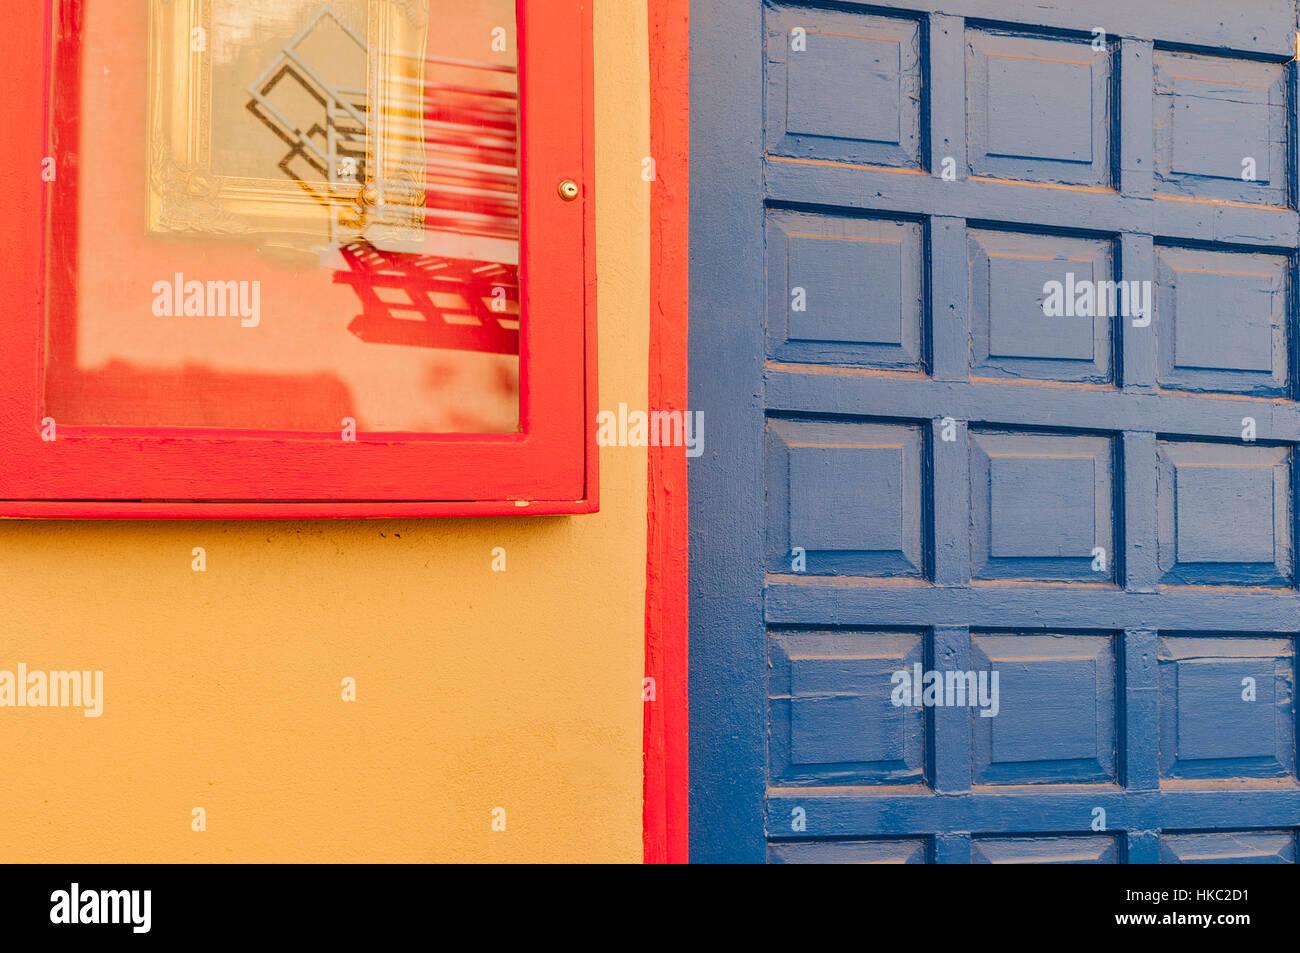 Framed America Stockfotos & Framed America Bilder - Alamy